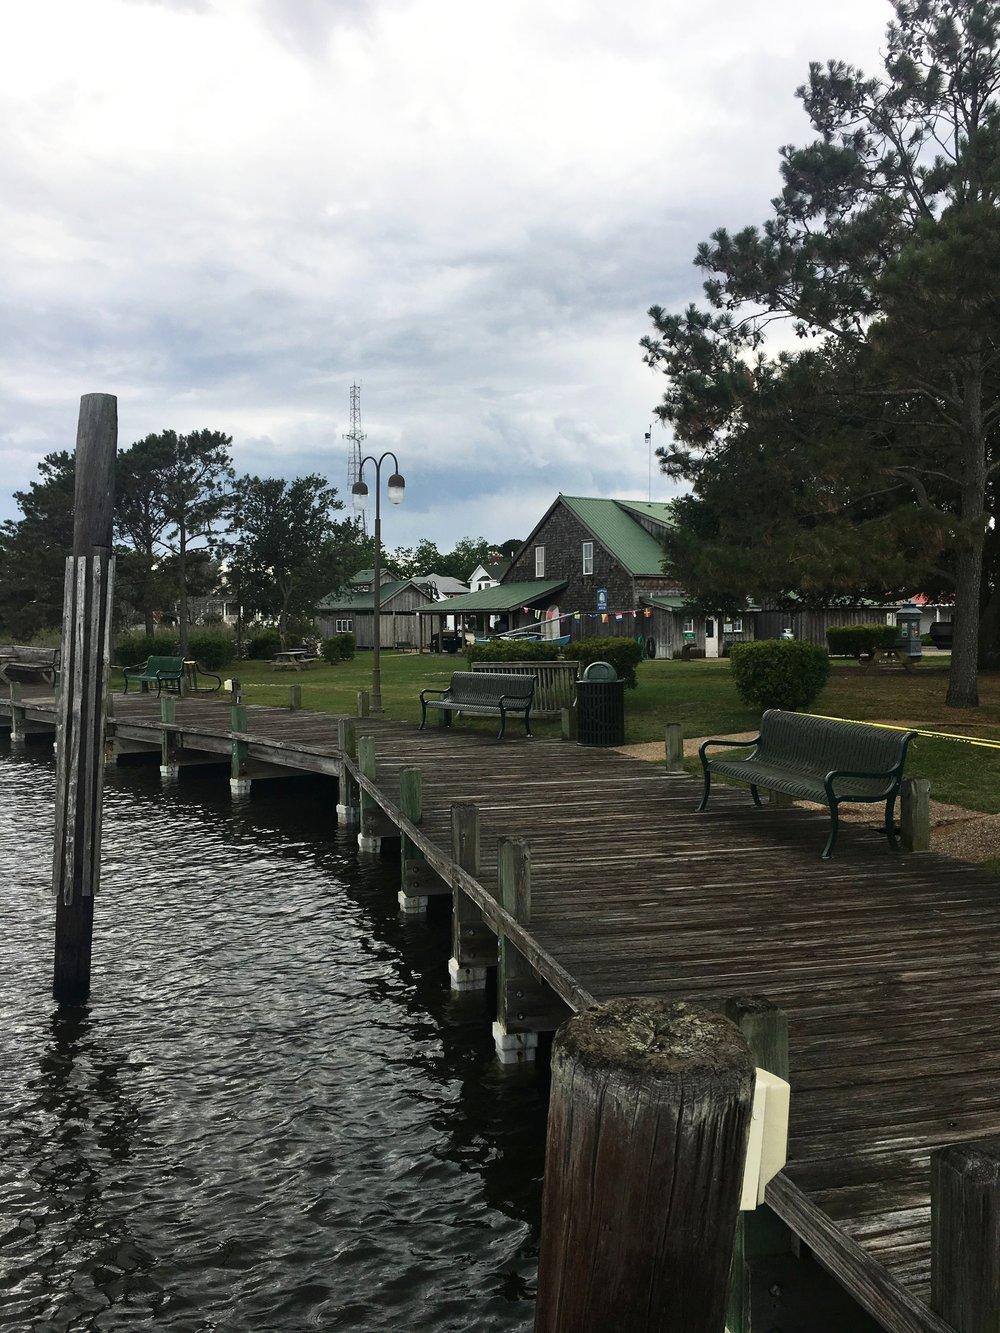 More Manteo waterfront!